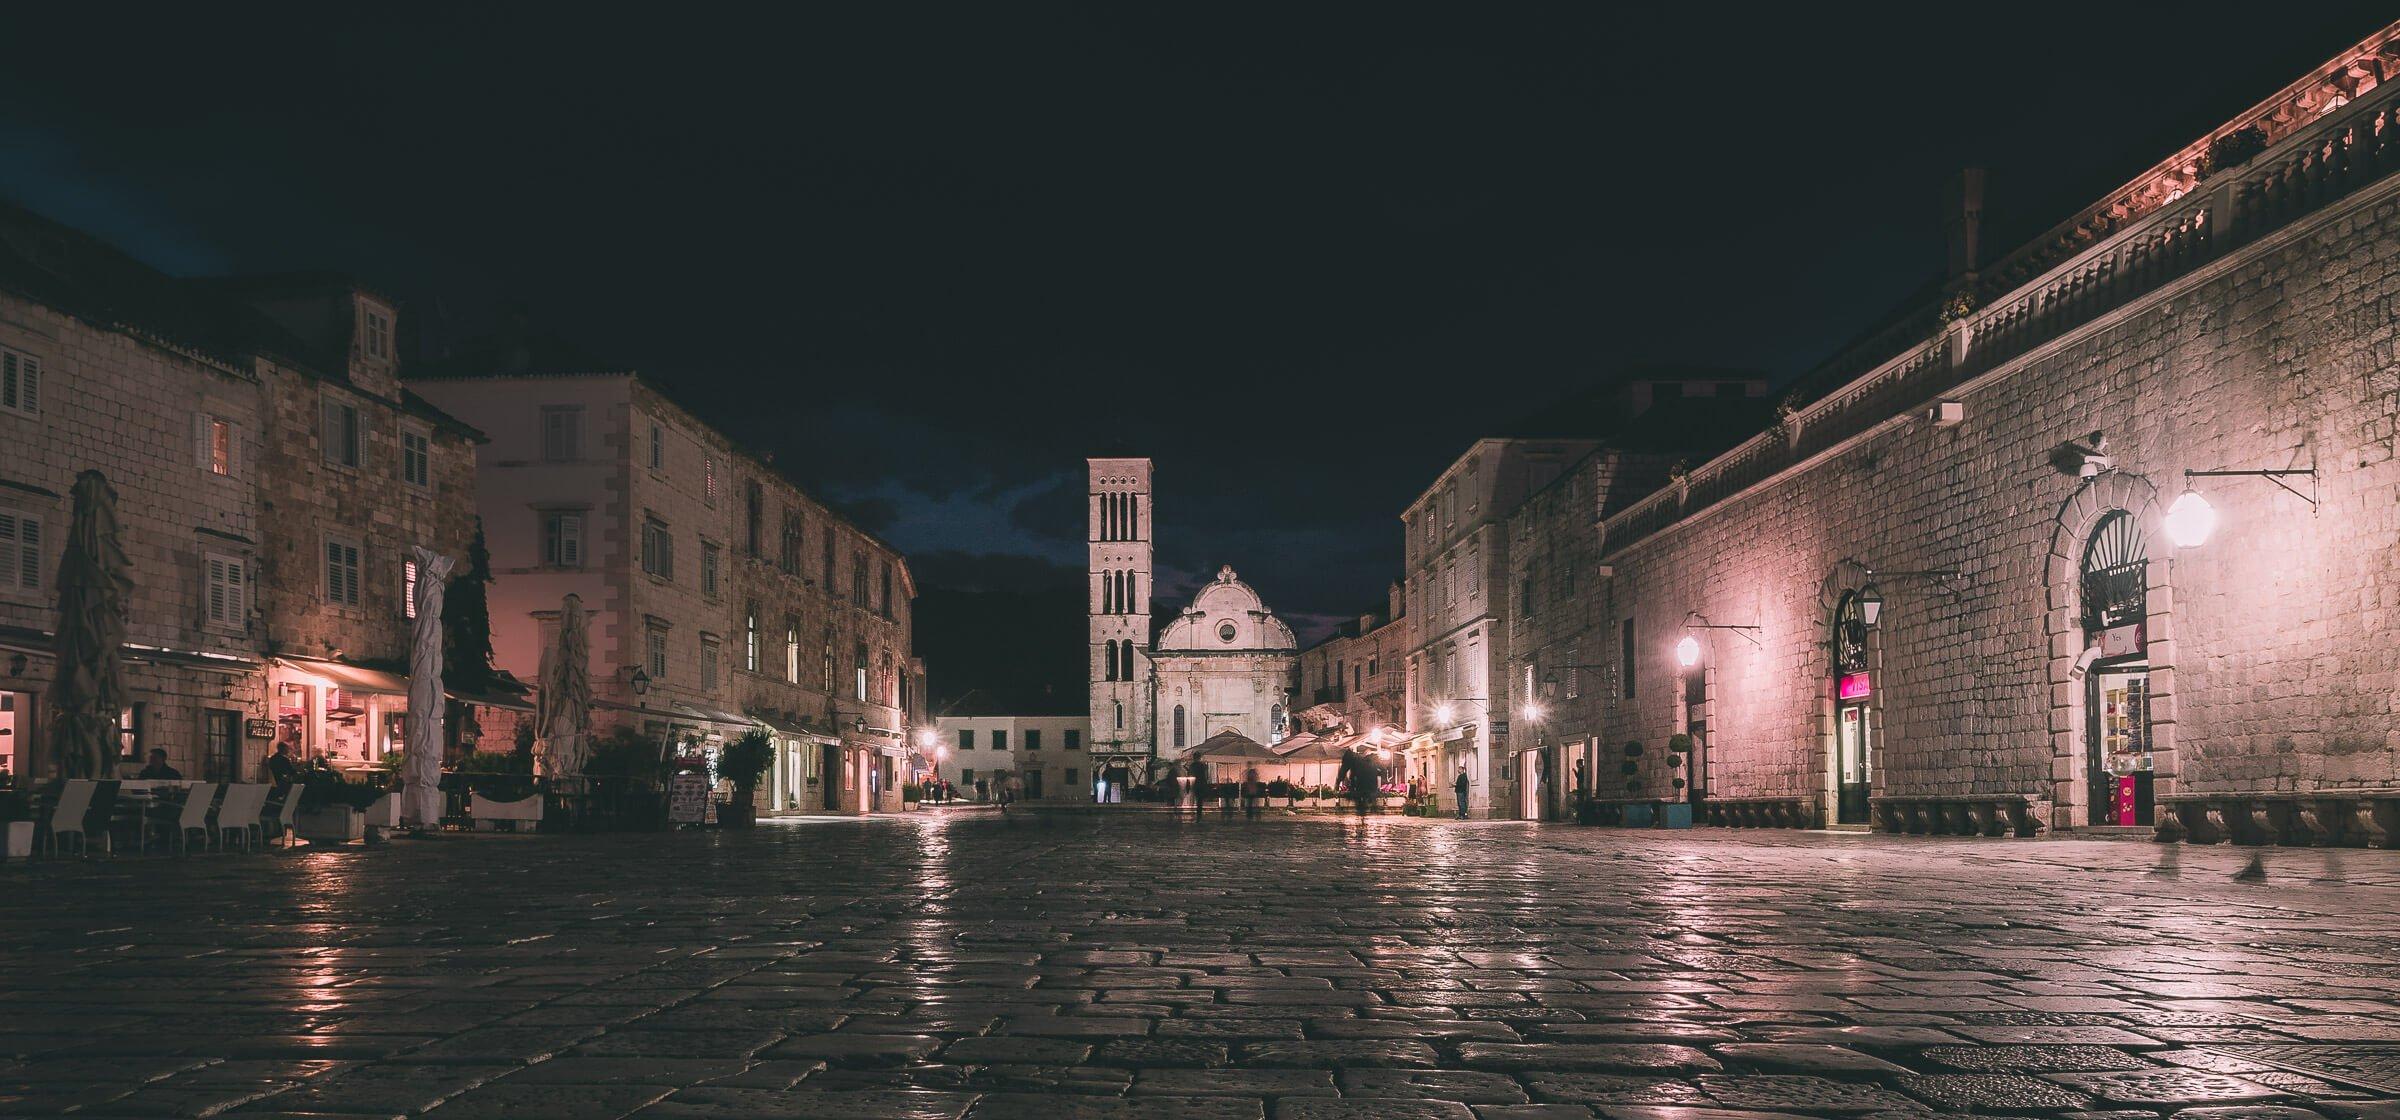 Old town Hvar, Croatia, at Night